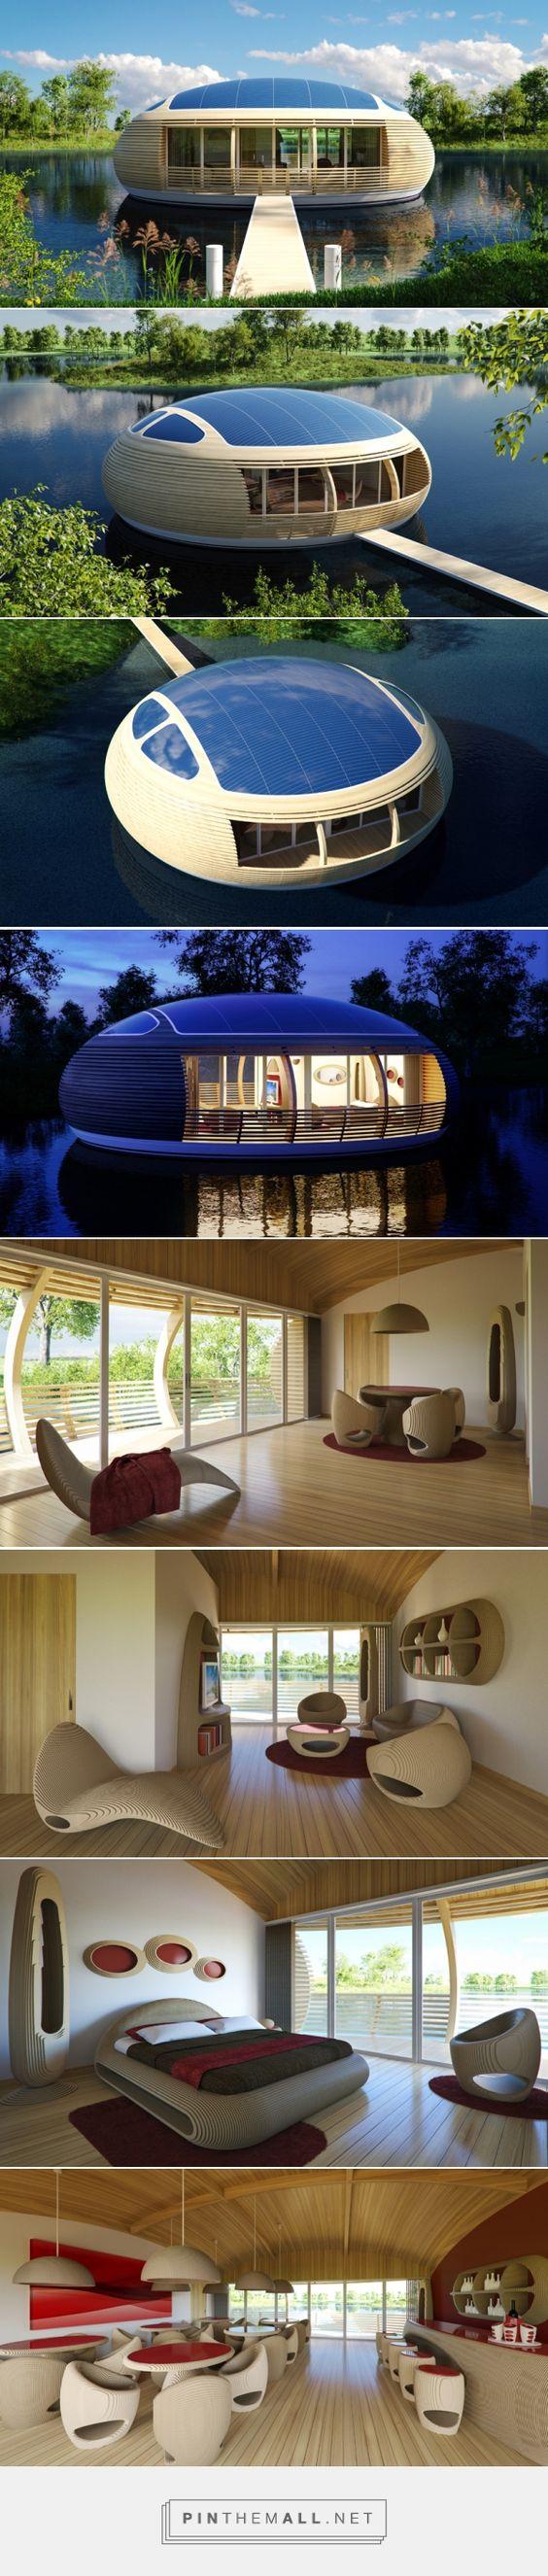 Moderna arhitektura - Page 3 91984110